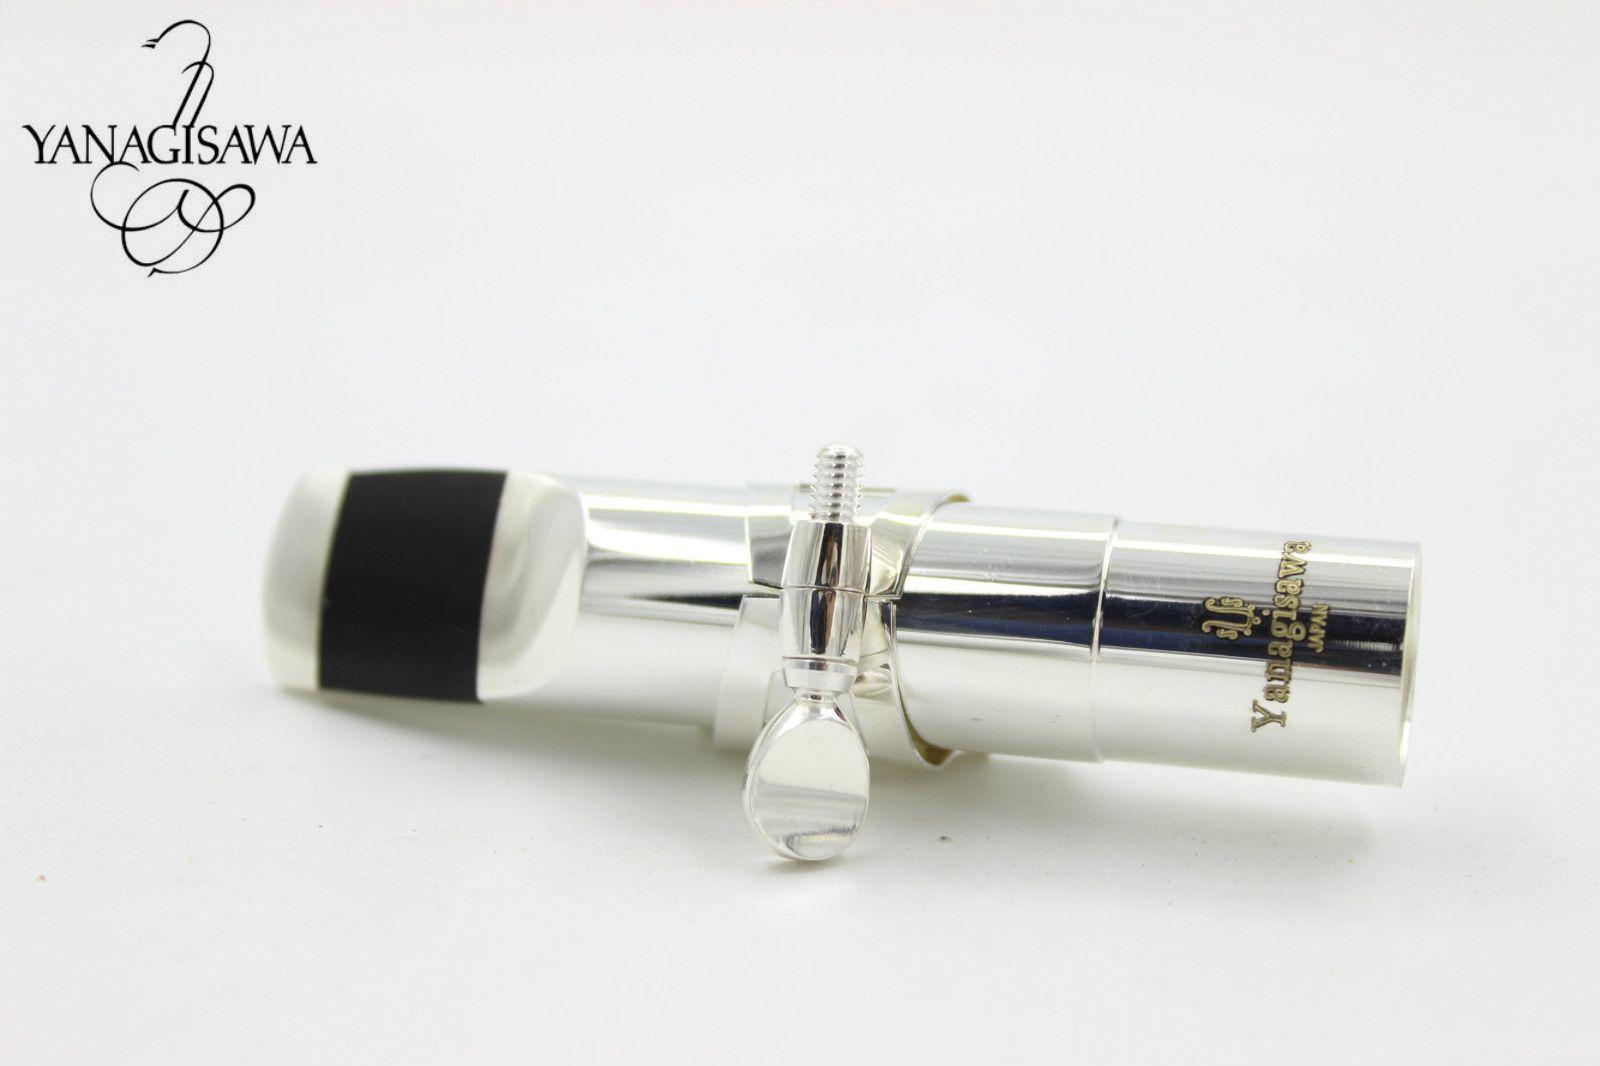 YANAGISAWA Metal Silver Plated Saxophone Musical Instrument Accessories Mouthpiece For Alto Tenor Soprano Saxophone No 5 6 7 8 9